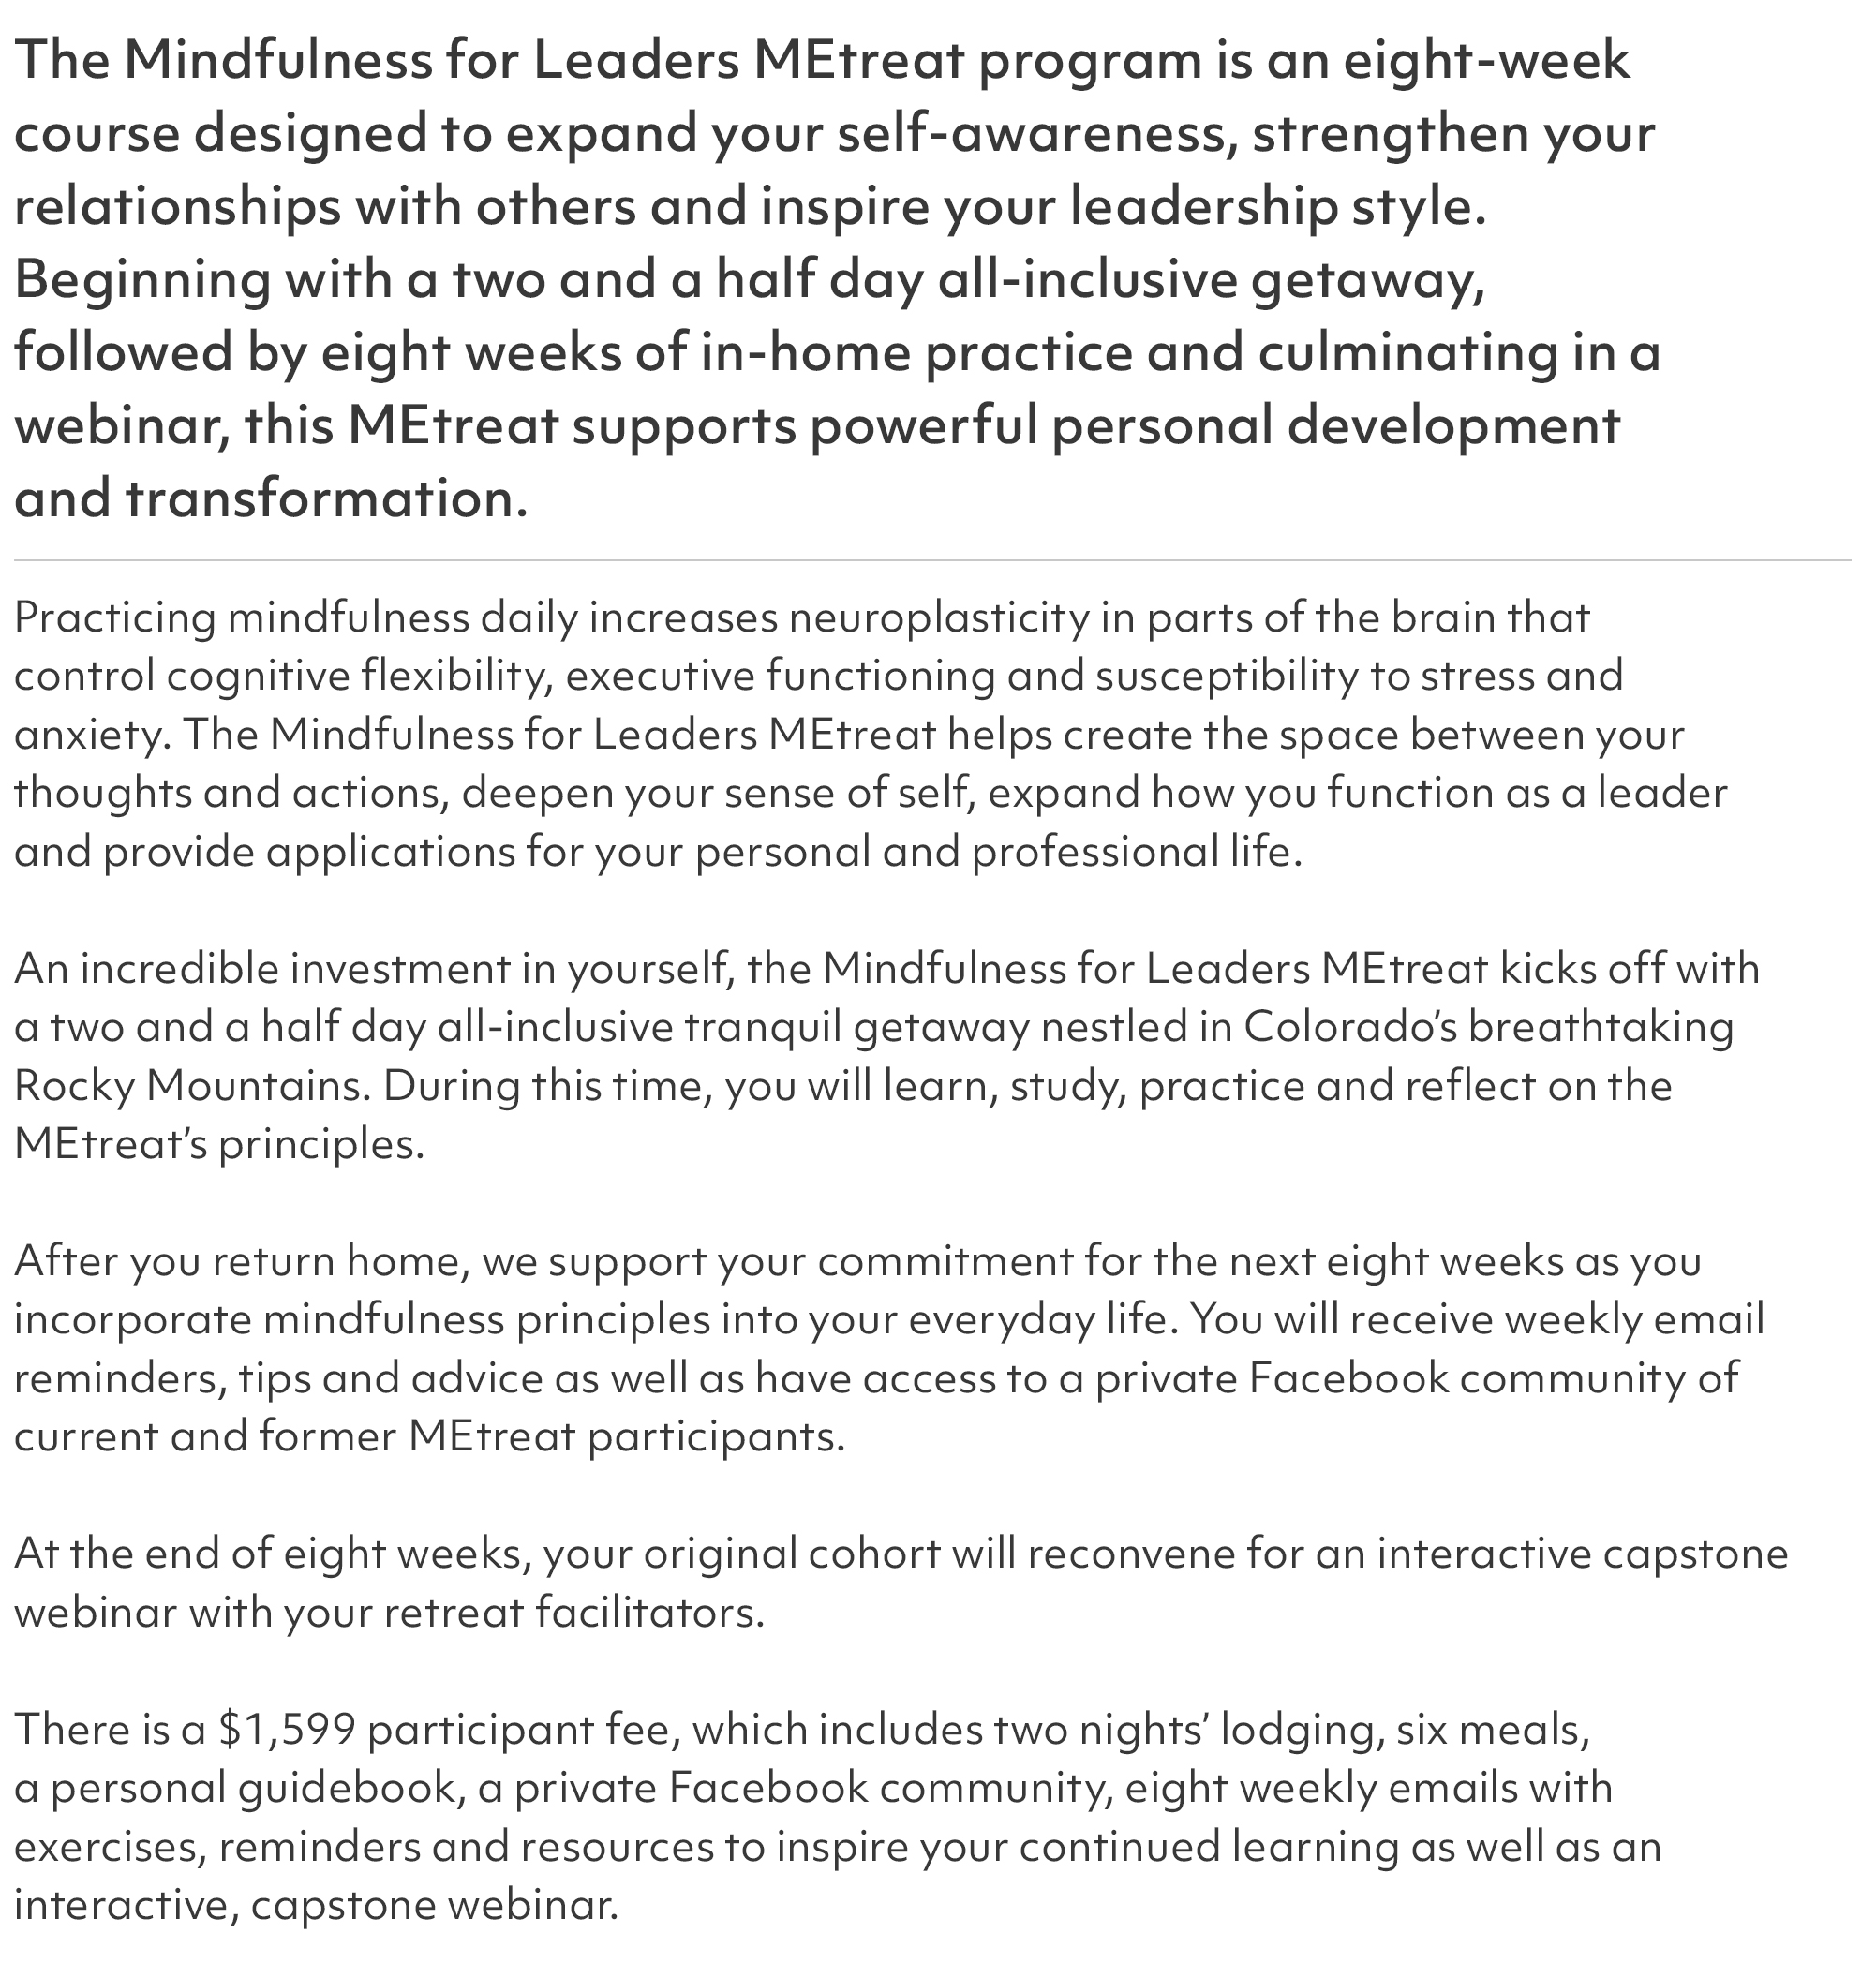 Mindfulness Summary 2